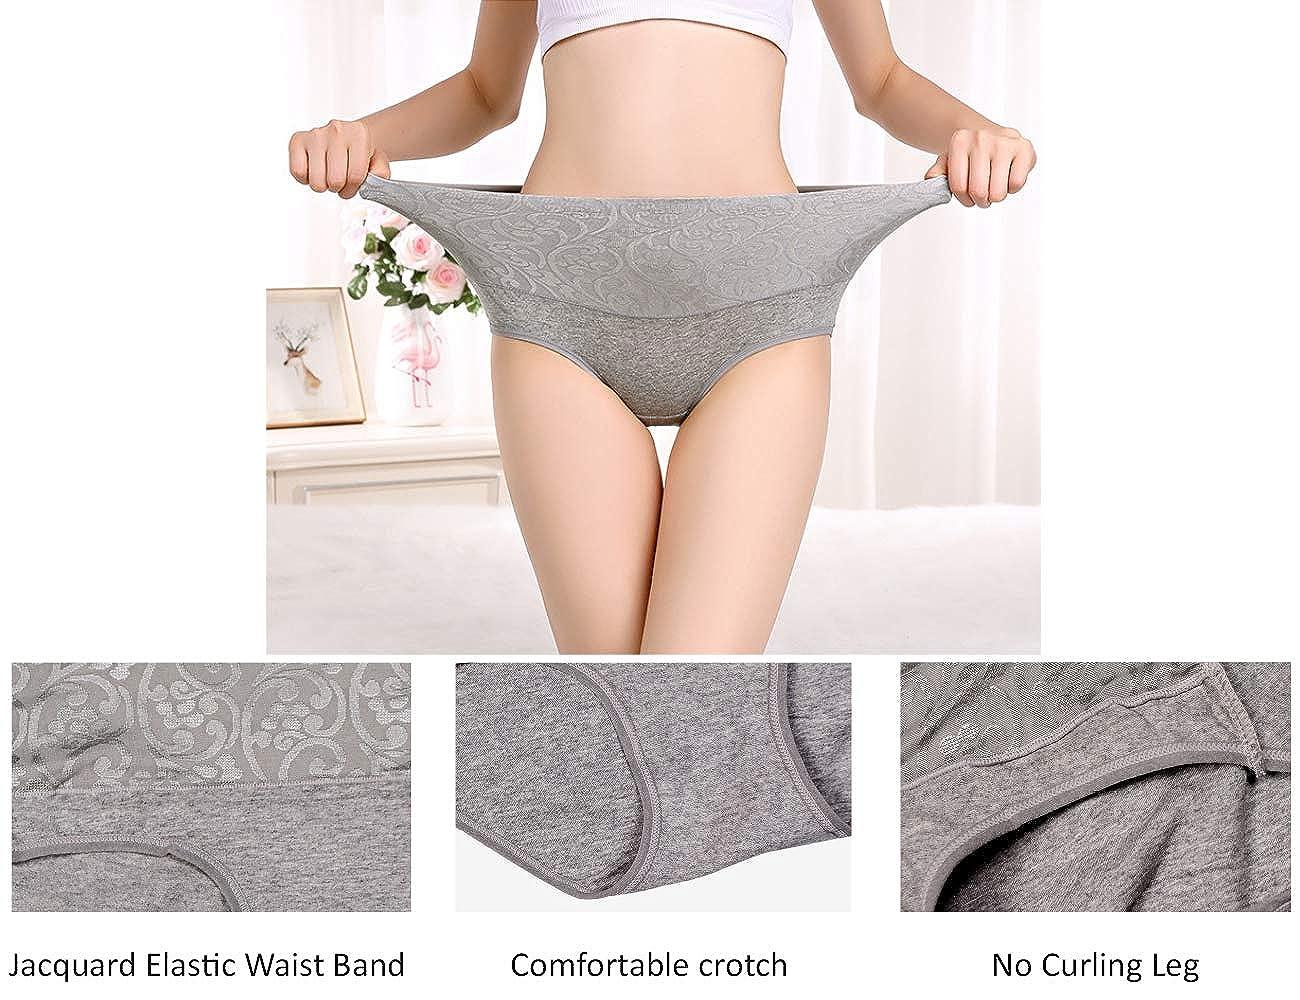 NINGMI Womens Underwear Stretchy Ladies Briefs High Waist Knickers Soft Cotton Panties 5 Pack